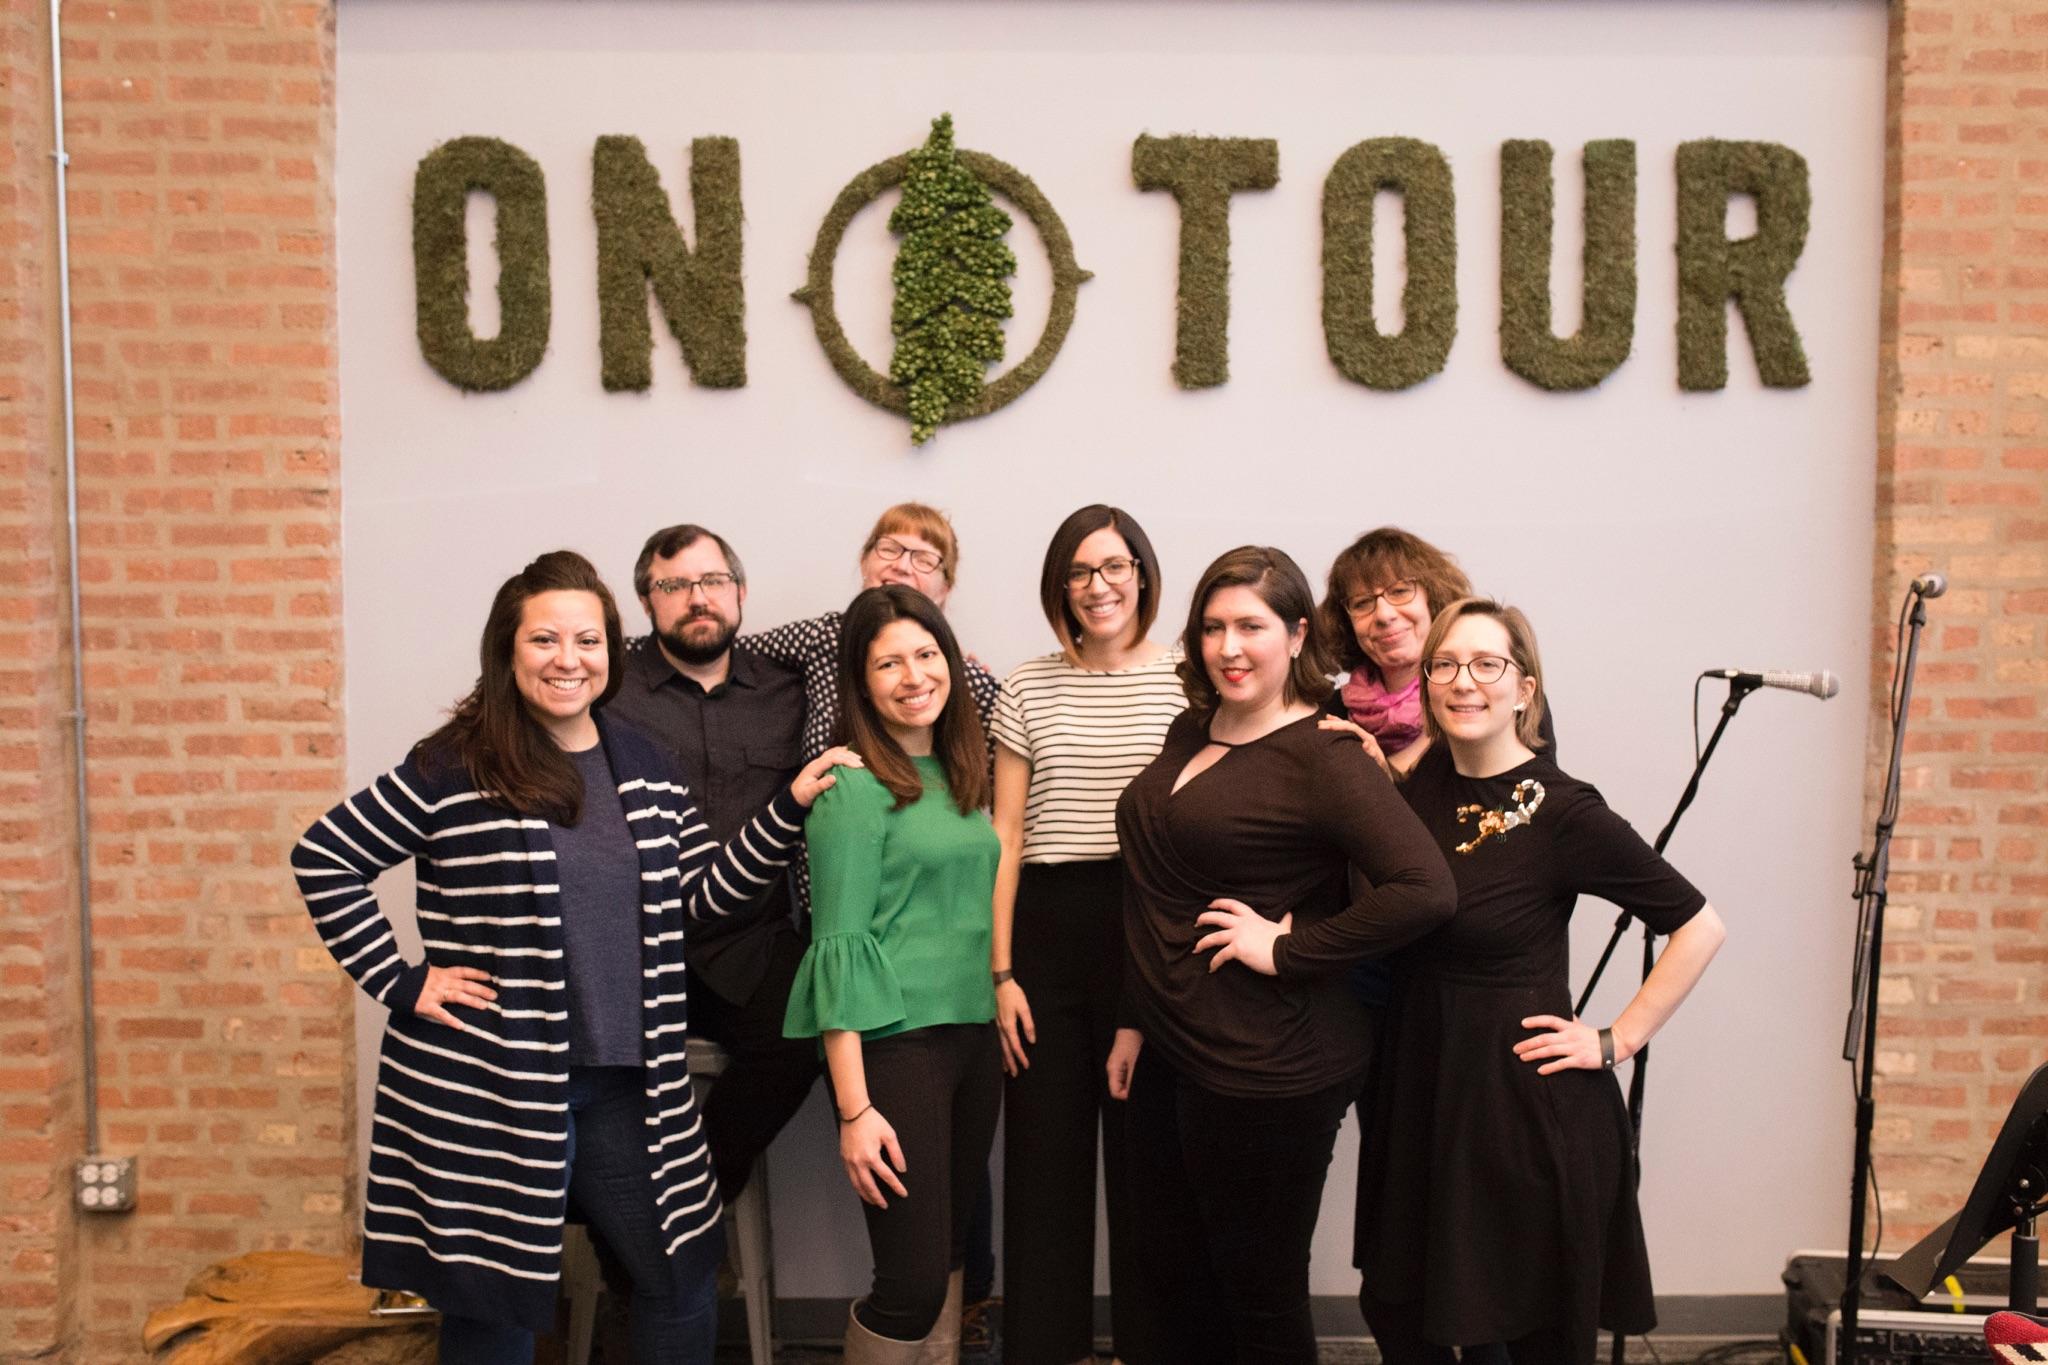 From left: Dee Fuentes (The host), Jason Fabeck, Megan Grandstaff, Jessica Perez, Brandi Morlen, Gina Waters, Sarah Michaelson, Christina Brandon (co-host and reader)  Photo credit: Wesley Fuentes